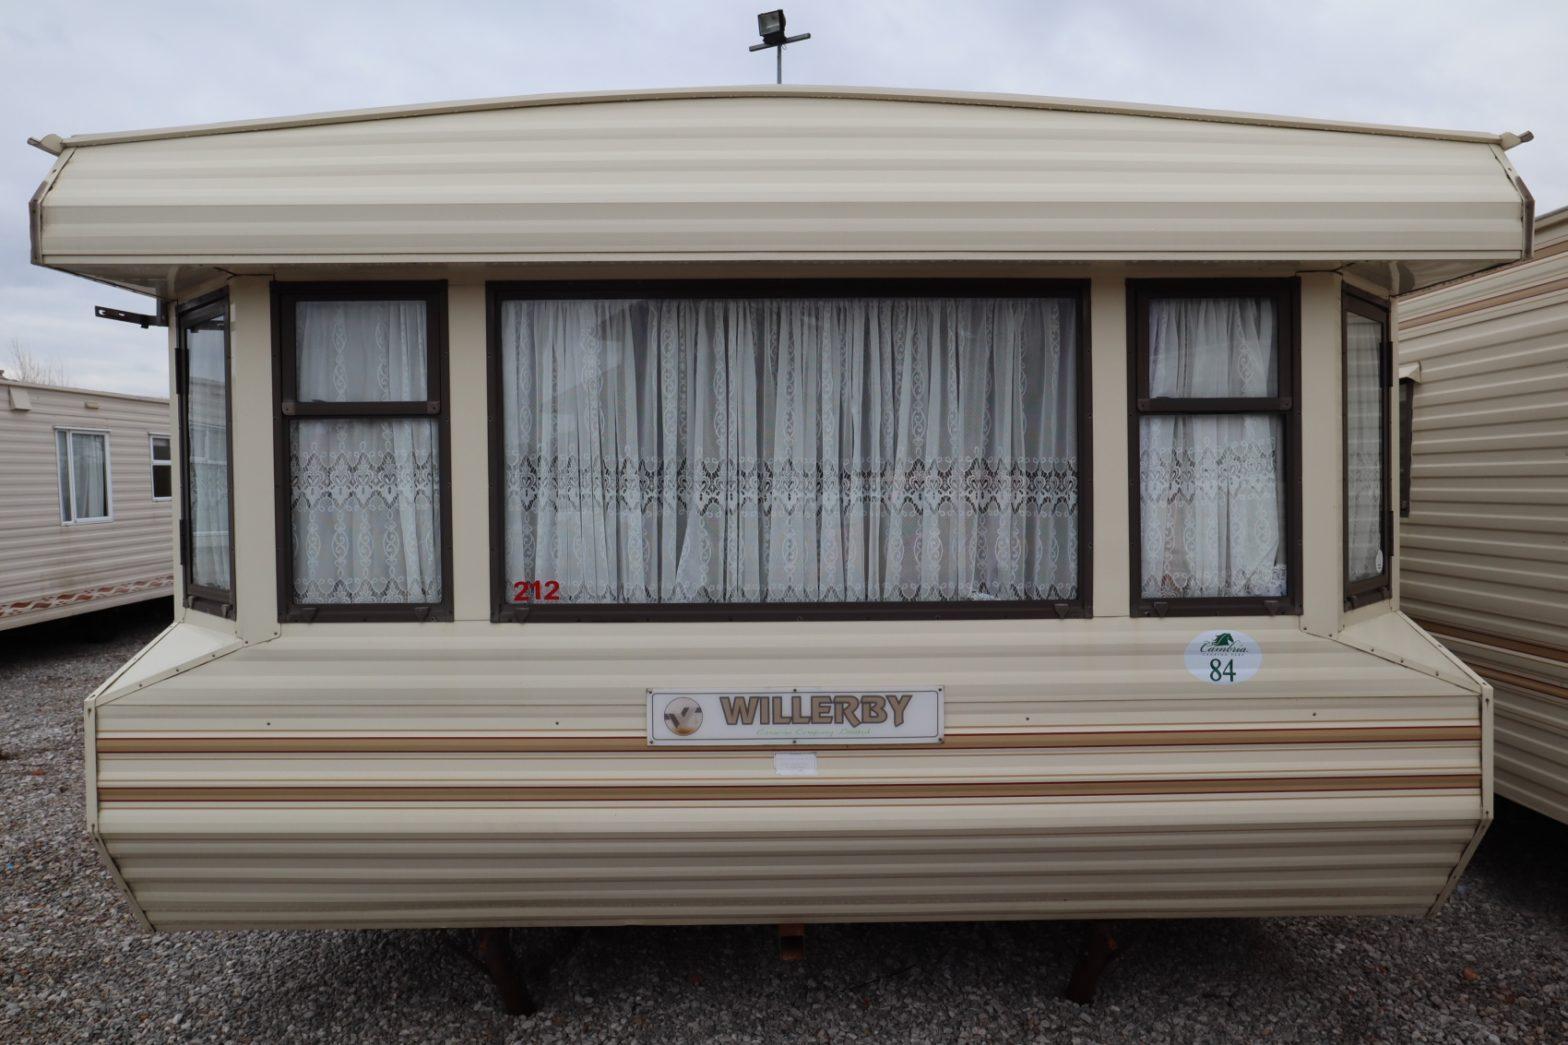 WILLERBY GRANADA J105